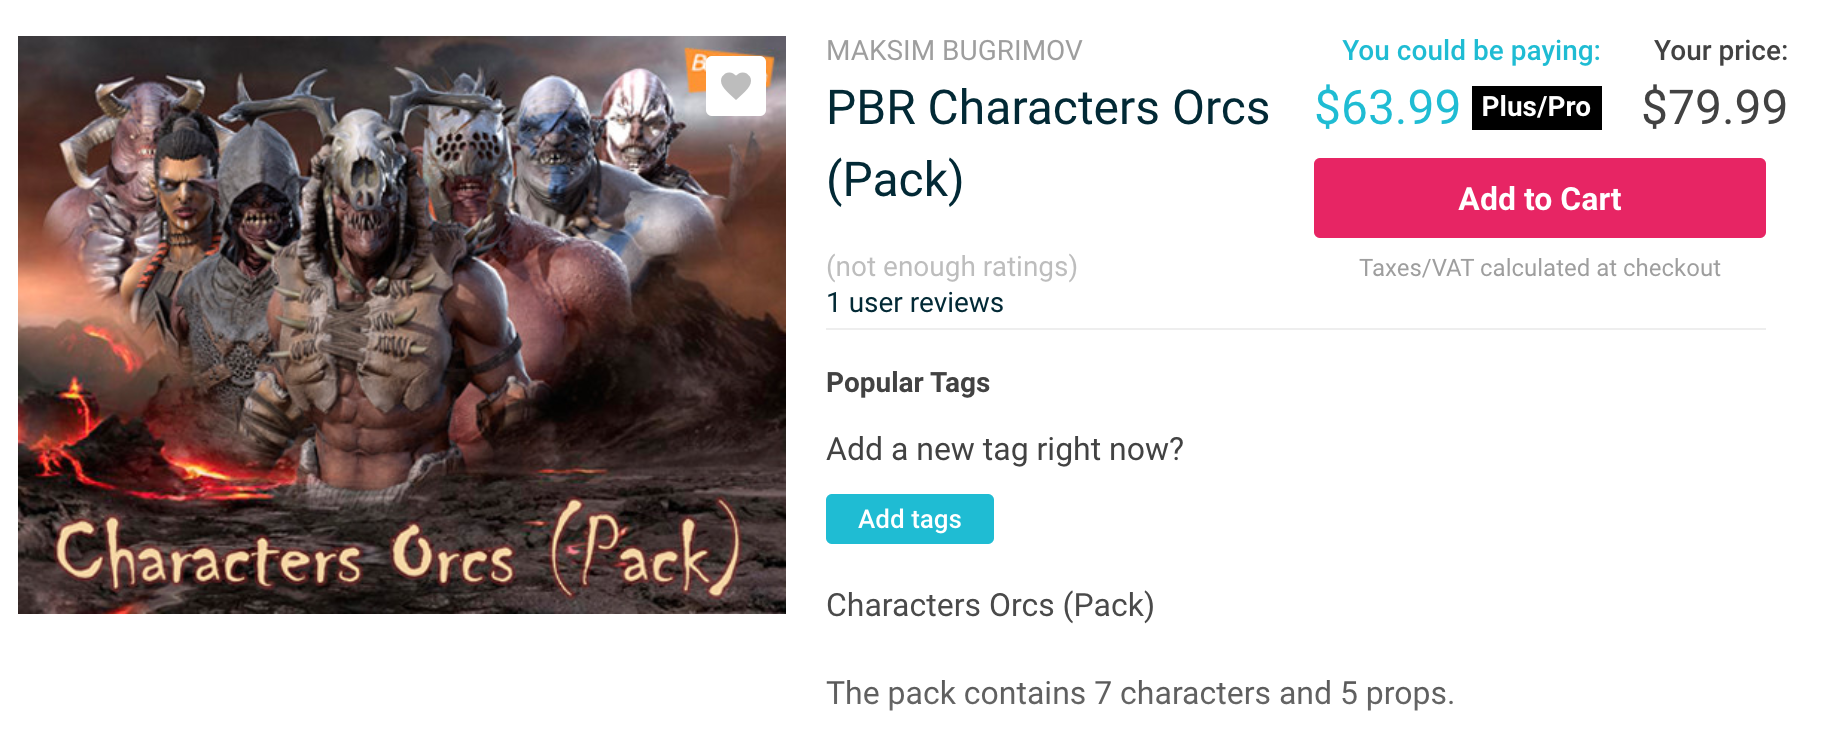 PBR Characters Orcs (Pack)介绍